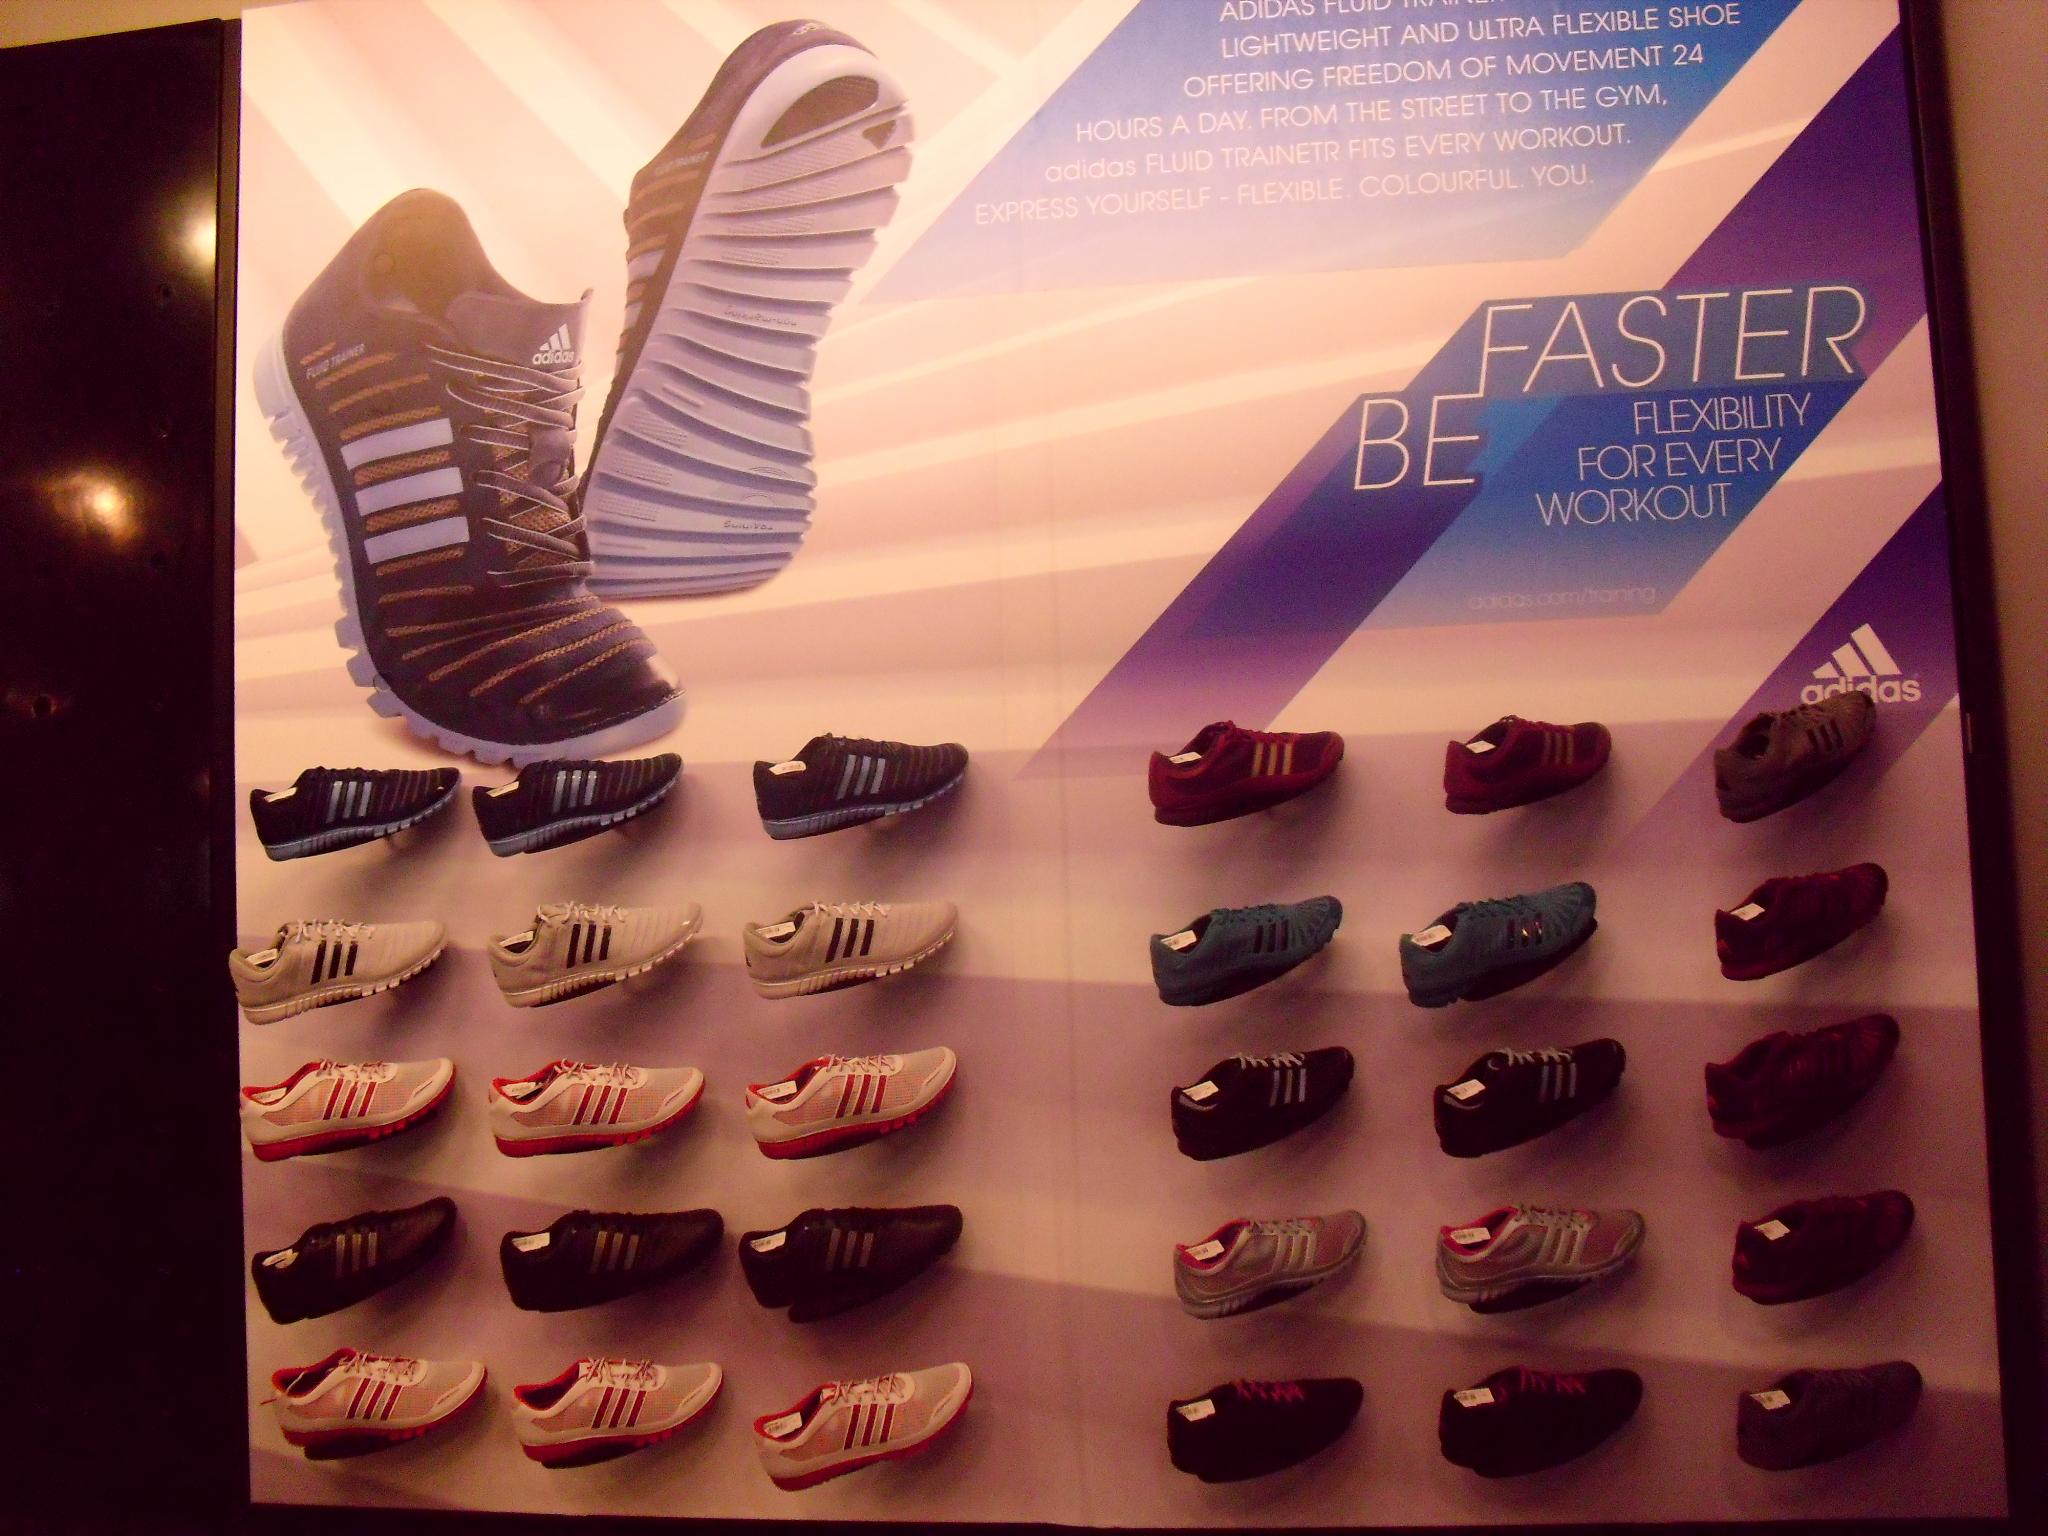 Adidas Fluid Trainer launch: Wall